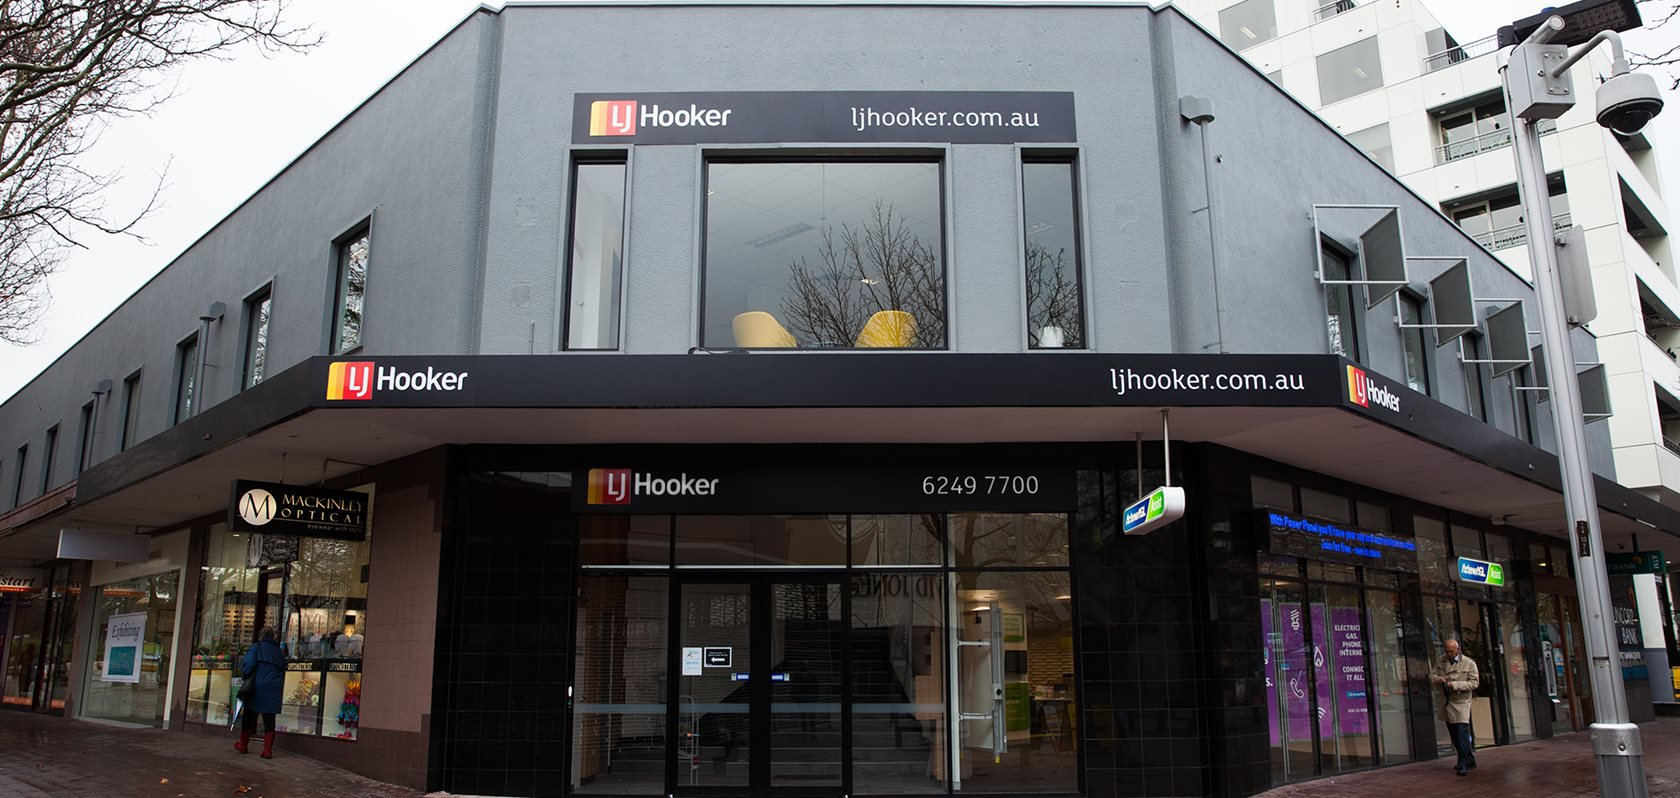 LJ Hooker Canberra City